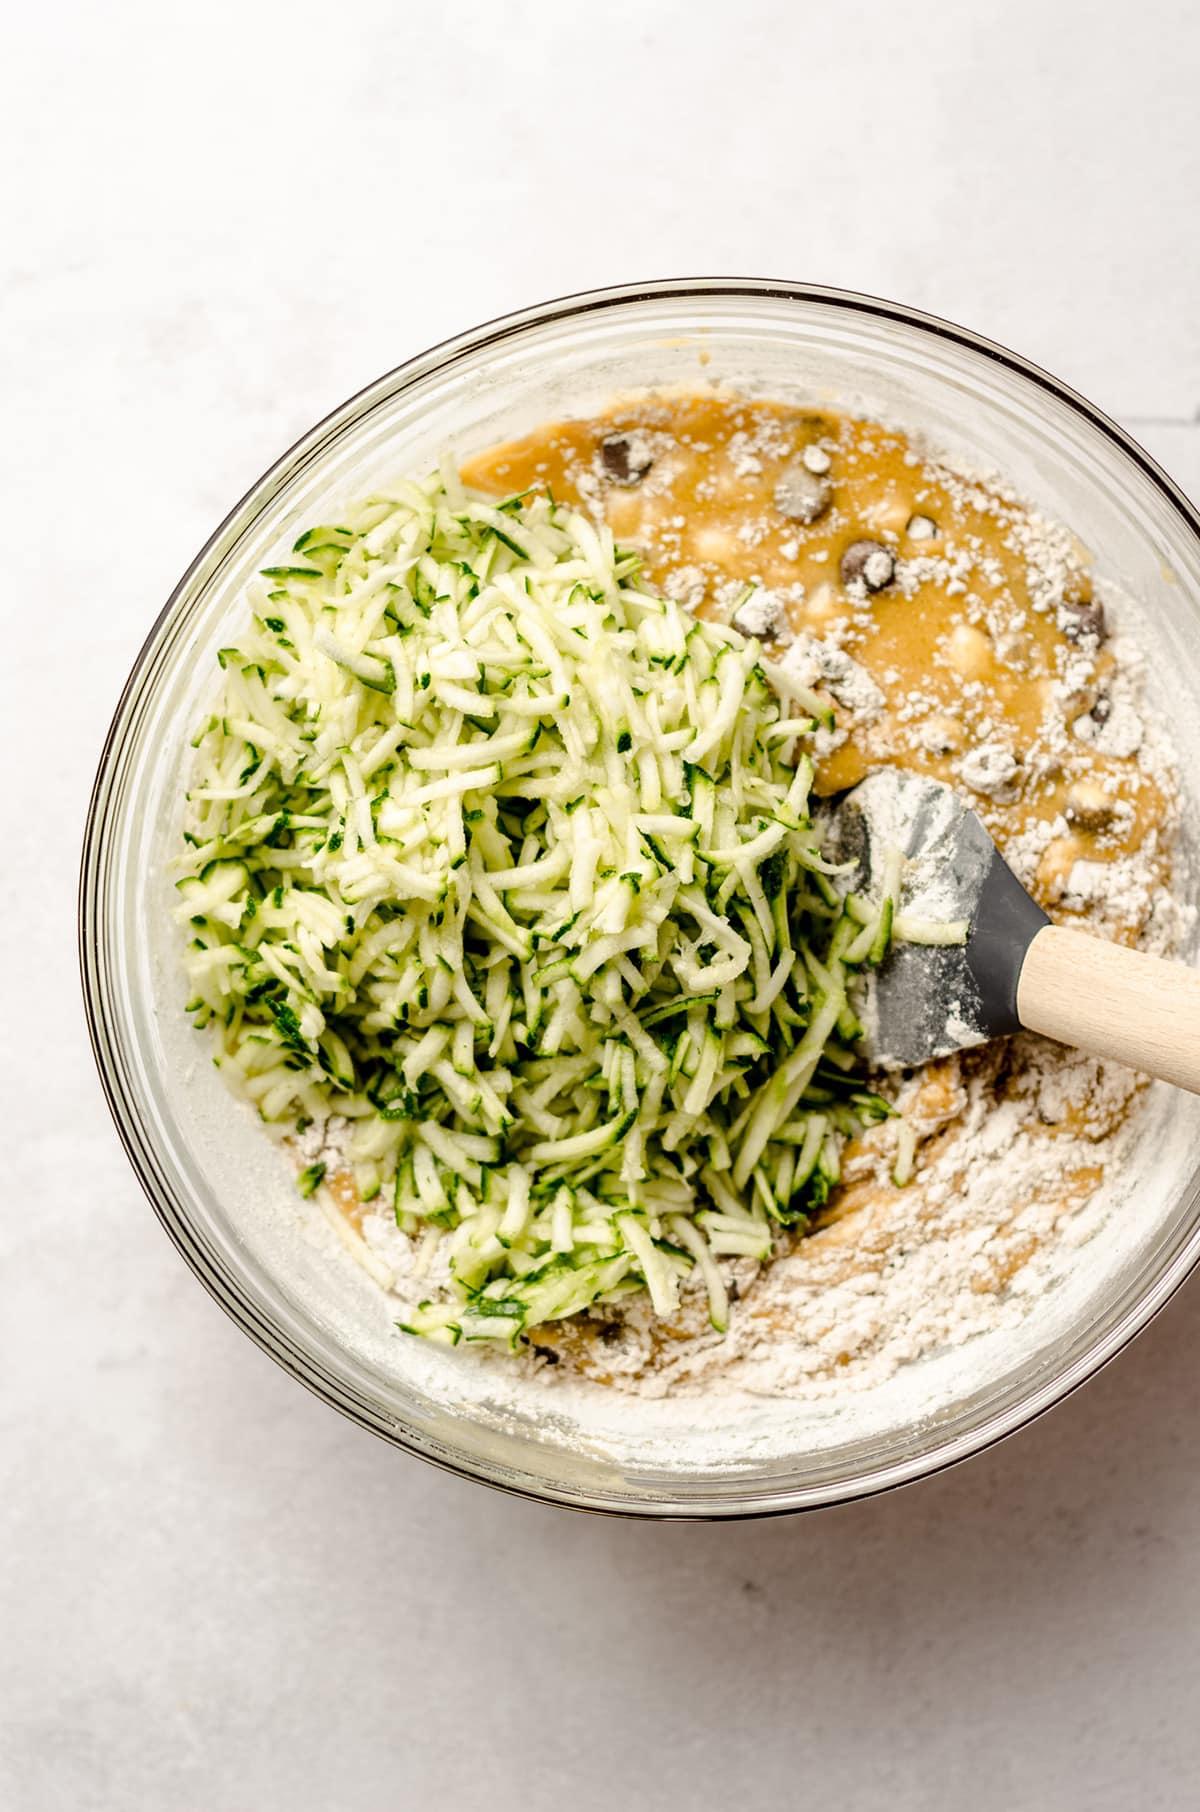 stirring shredded zucchini into chocolate chip zucchini bread batter